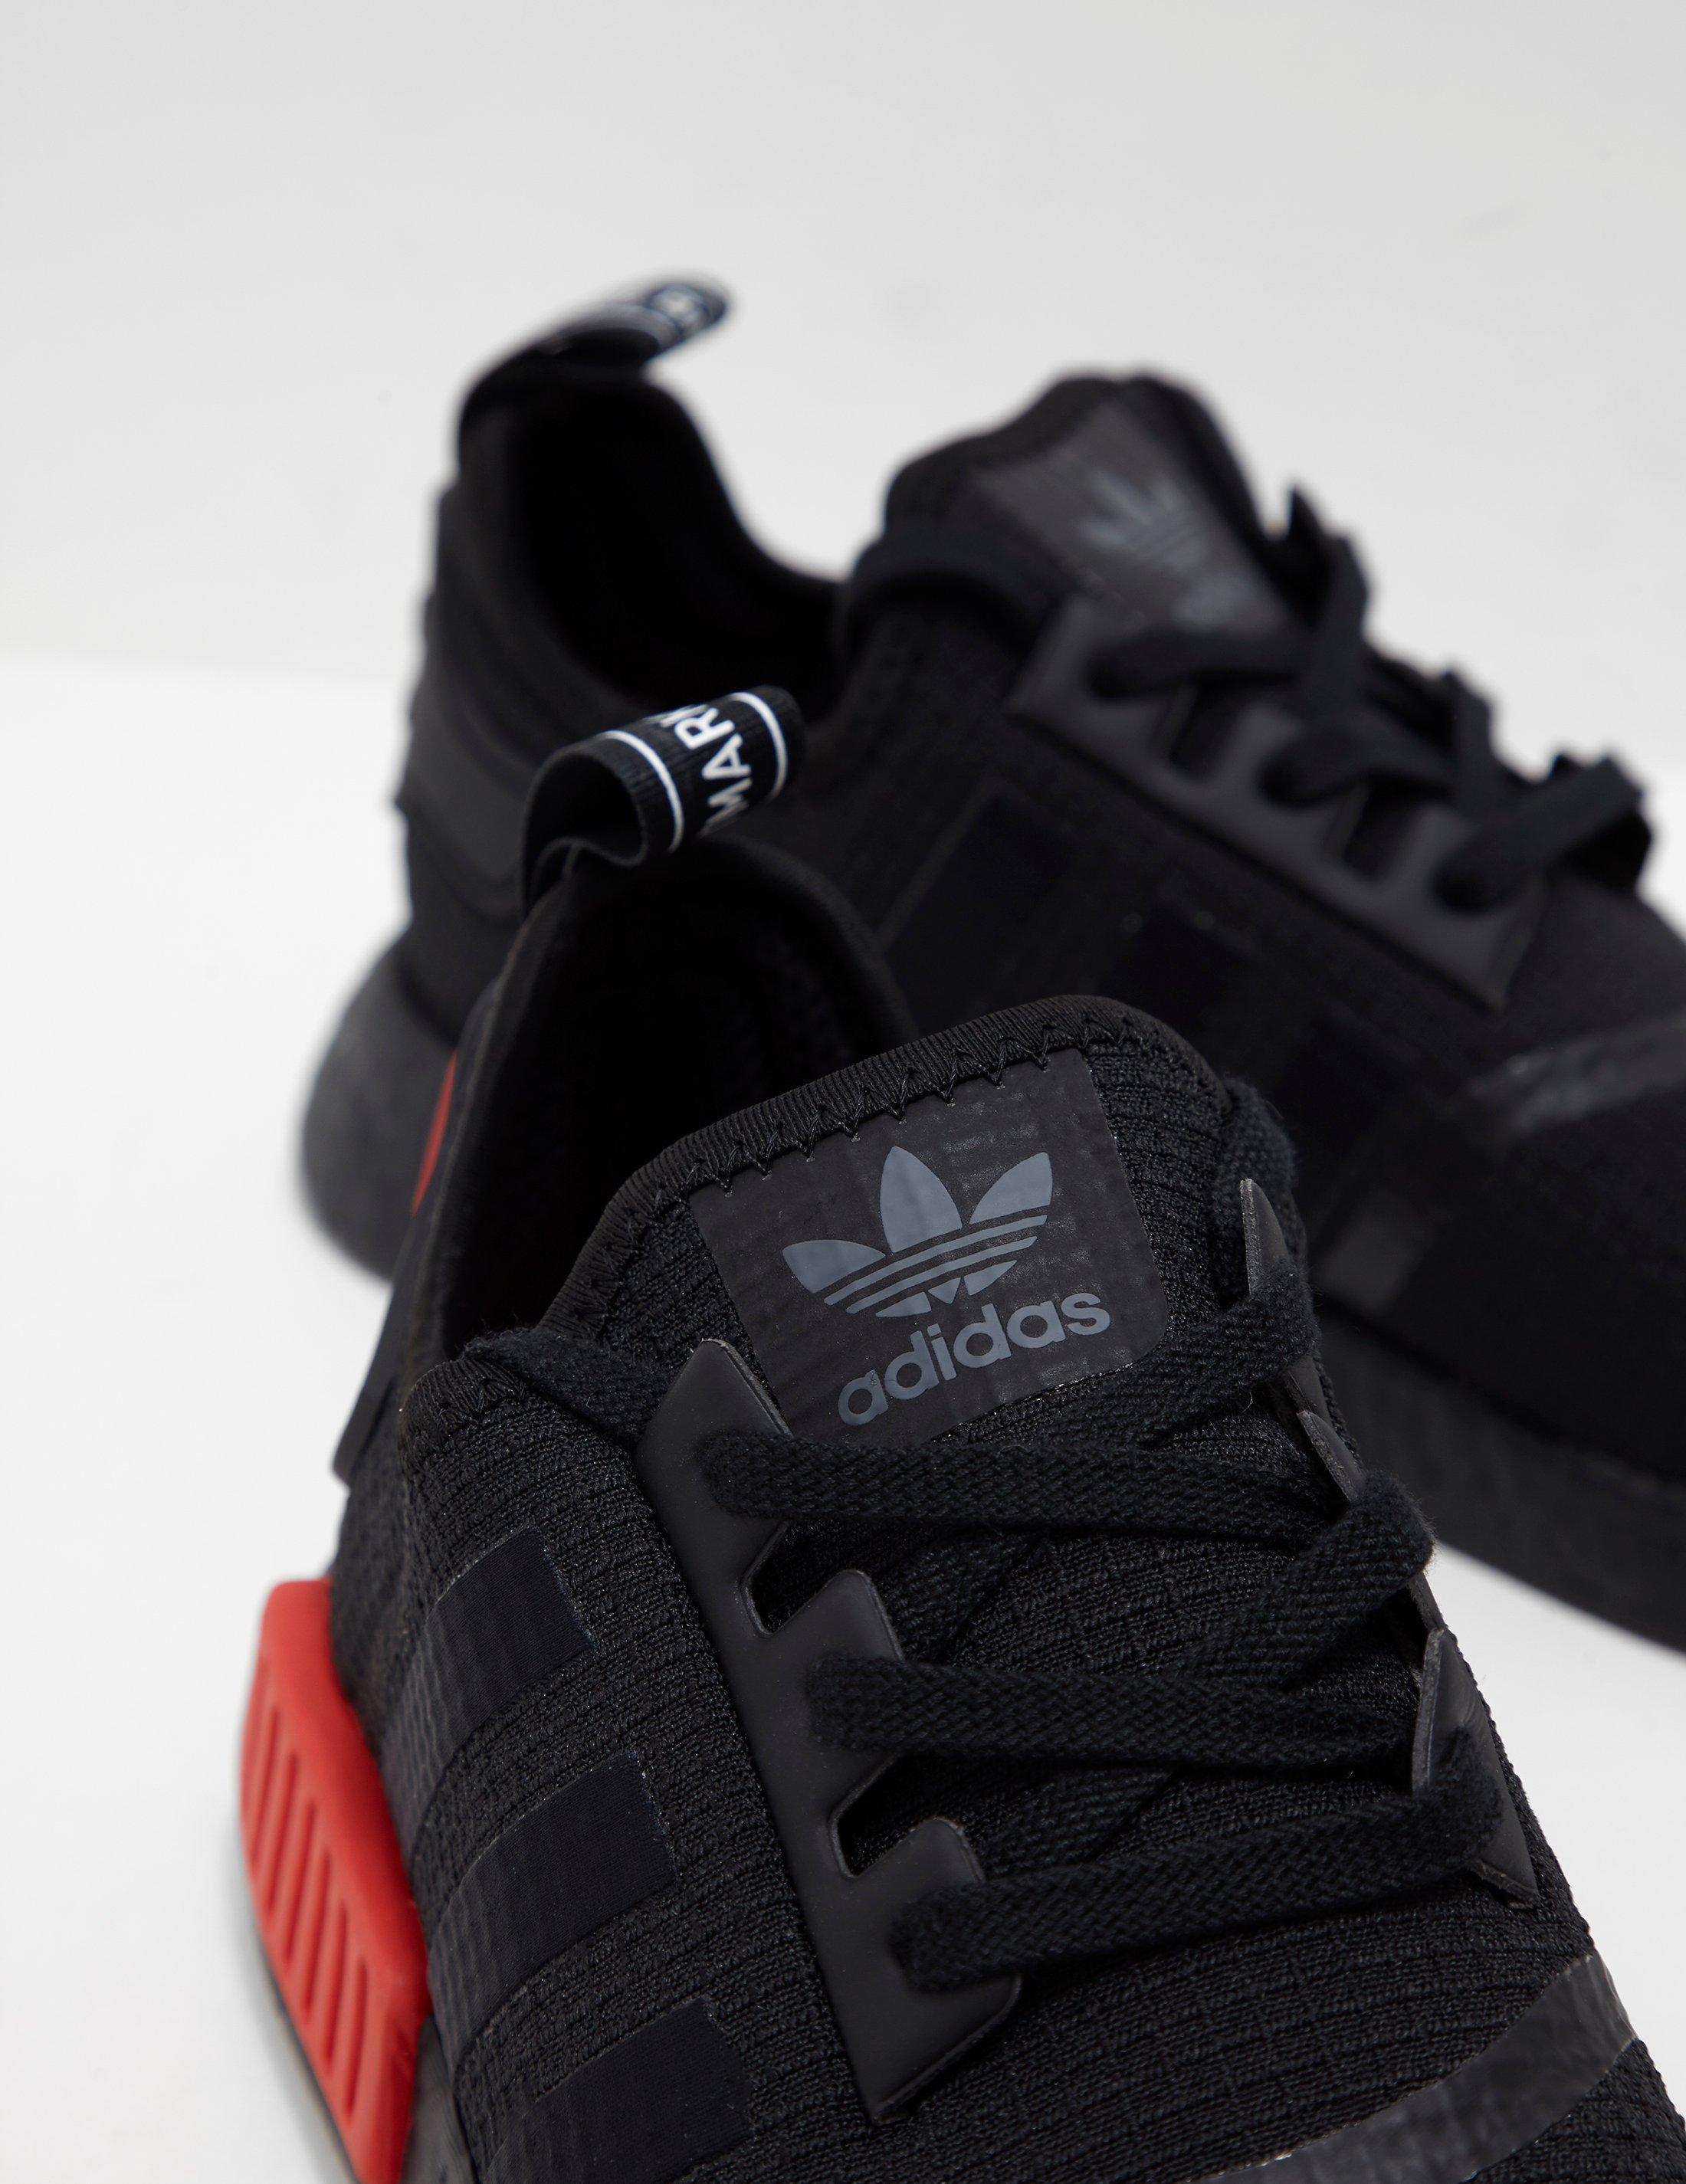 8e37c9a08 Lyst - adidas Originals Mens Nmd R1 Ripstop Black in Black for Men